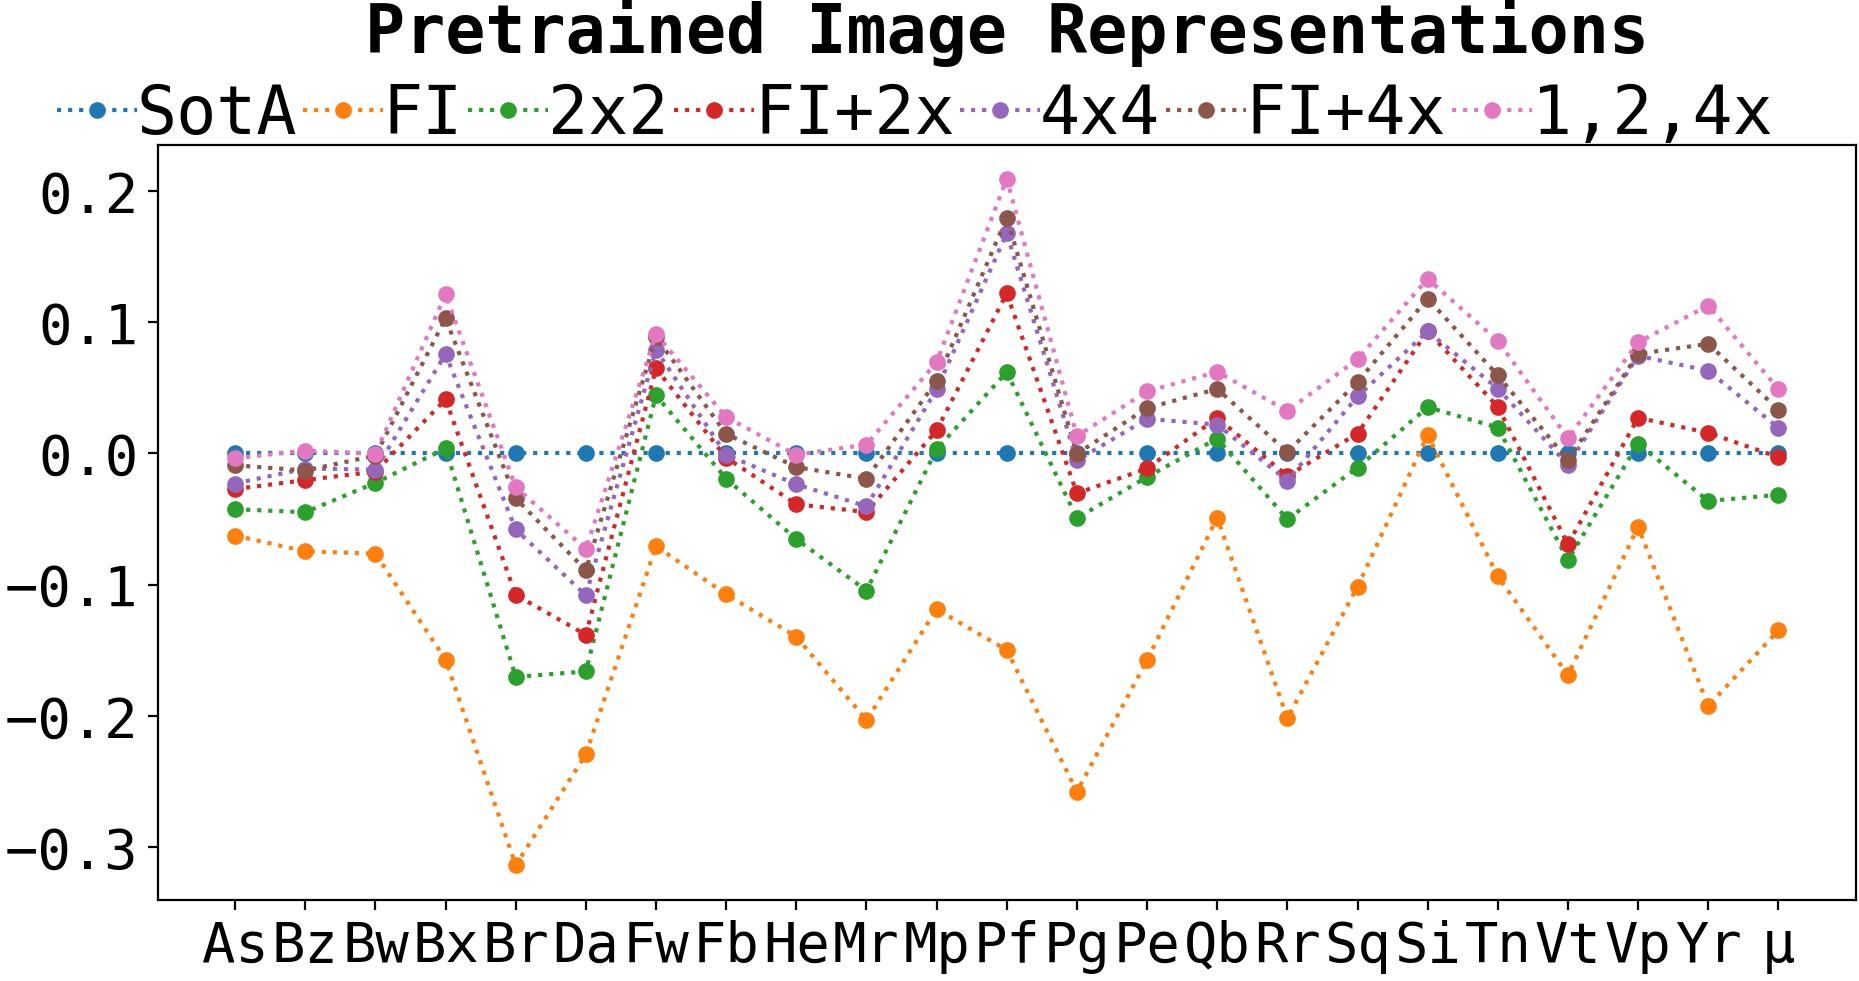 SotA vs pretrained representations for patches (vanilla).